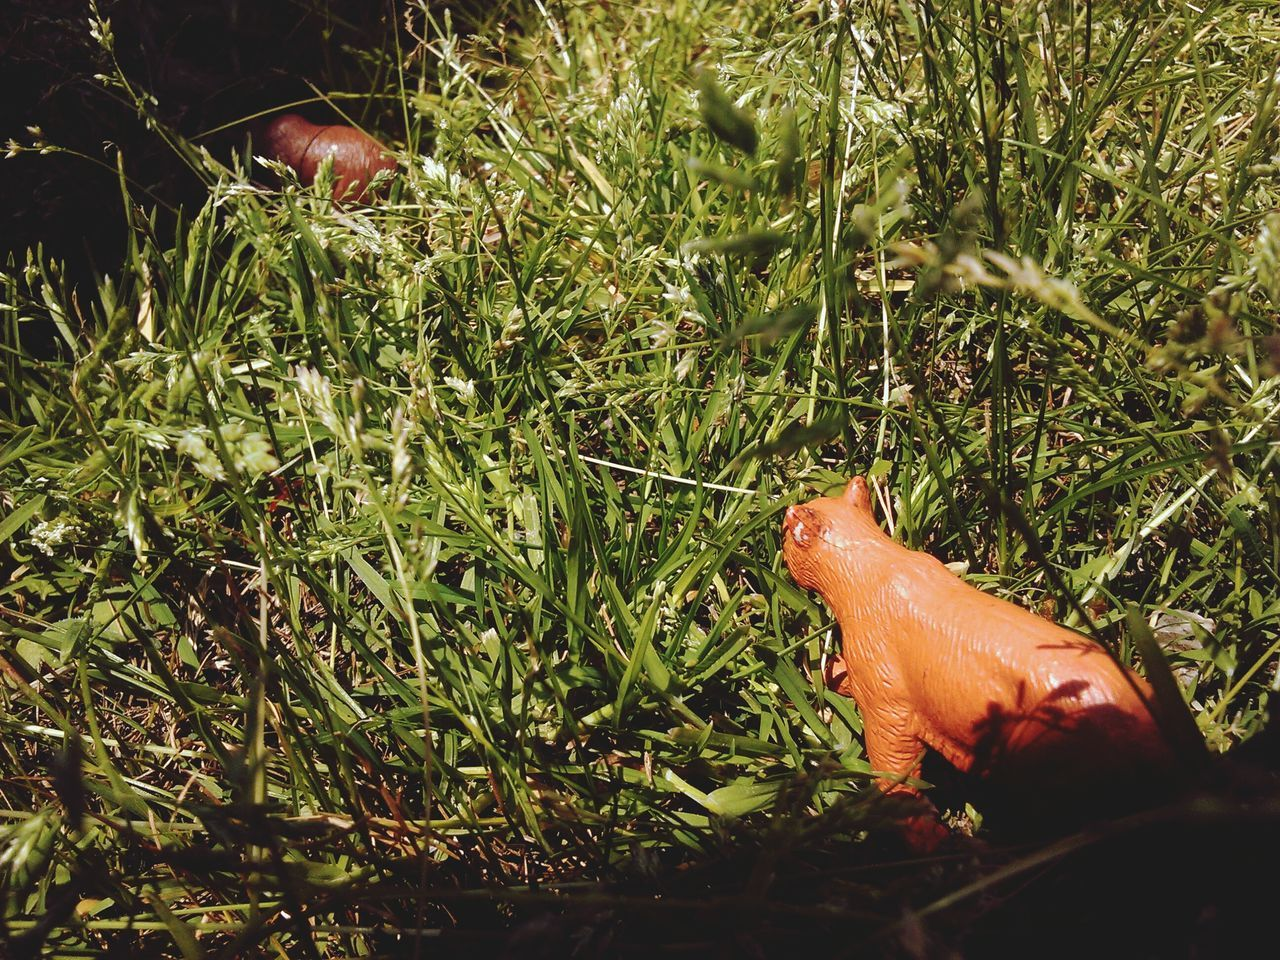 Toys On Grassy Field